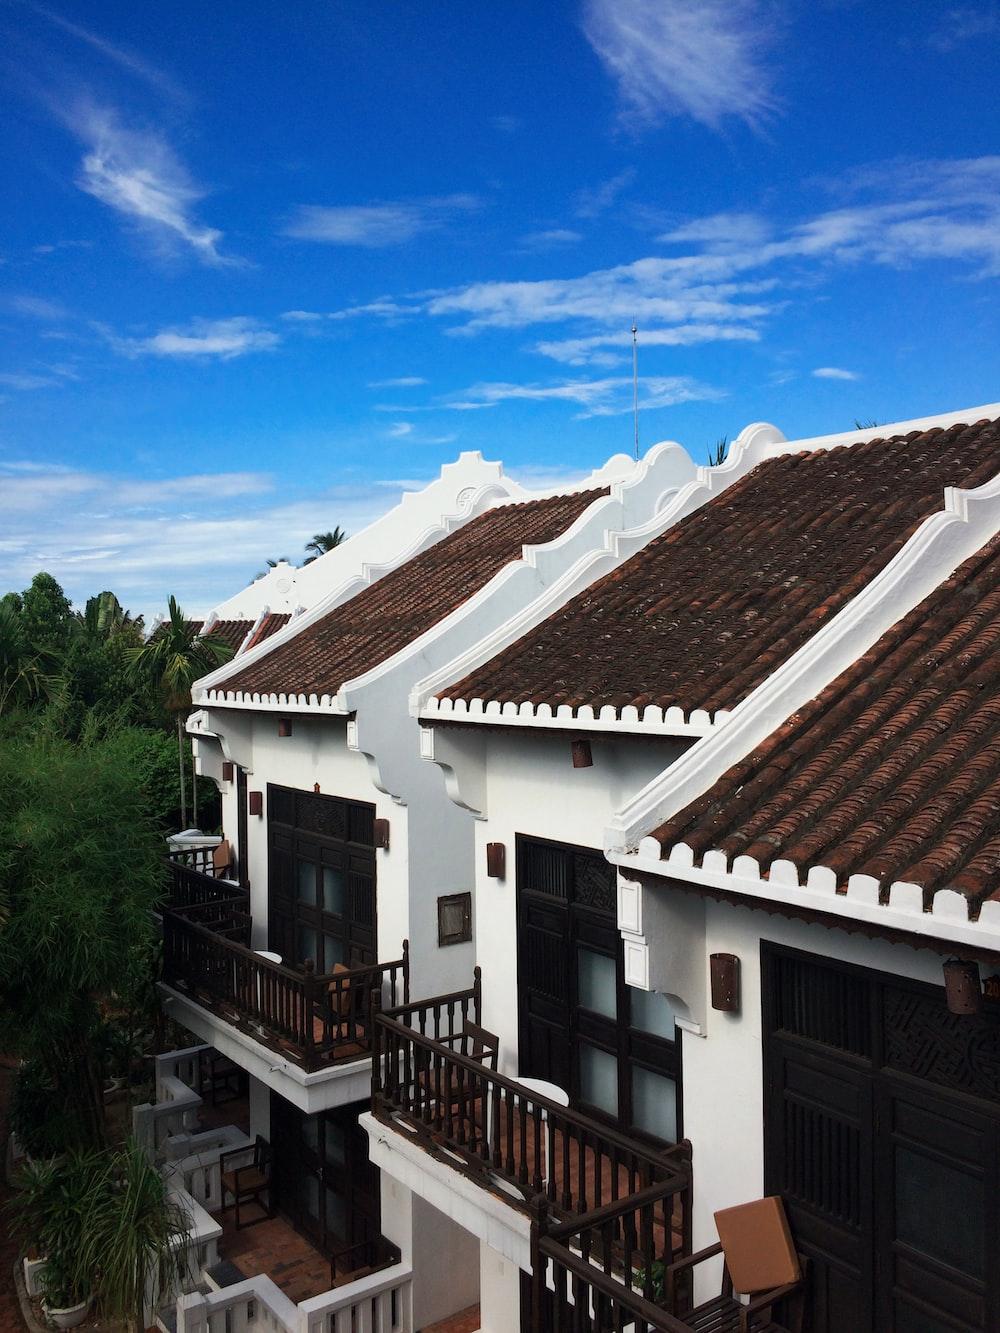 white and brown concrete house under a calm blue sky